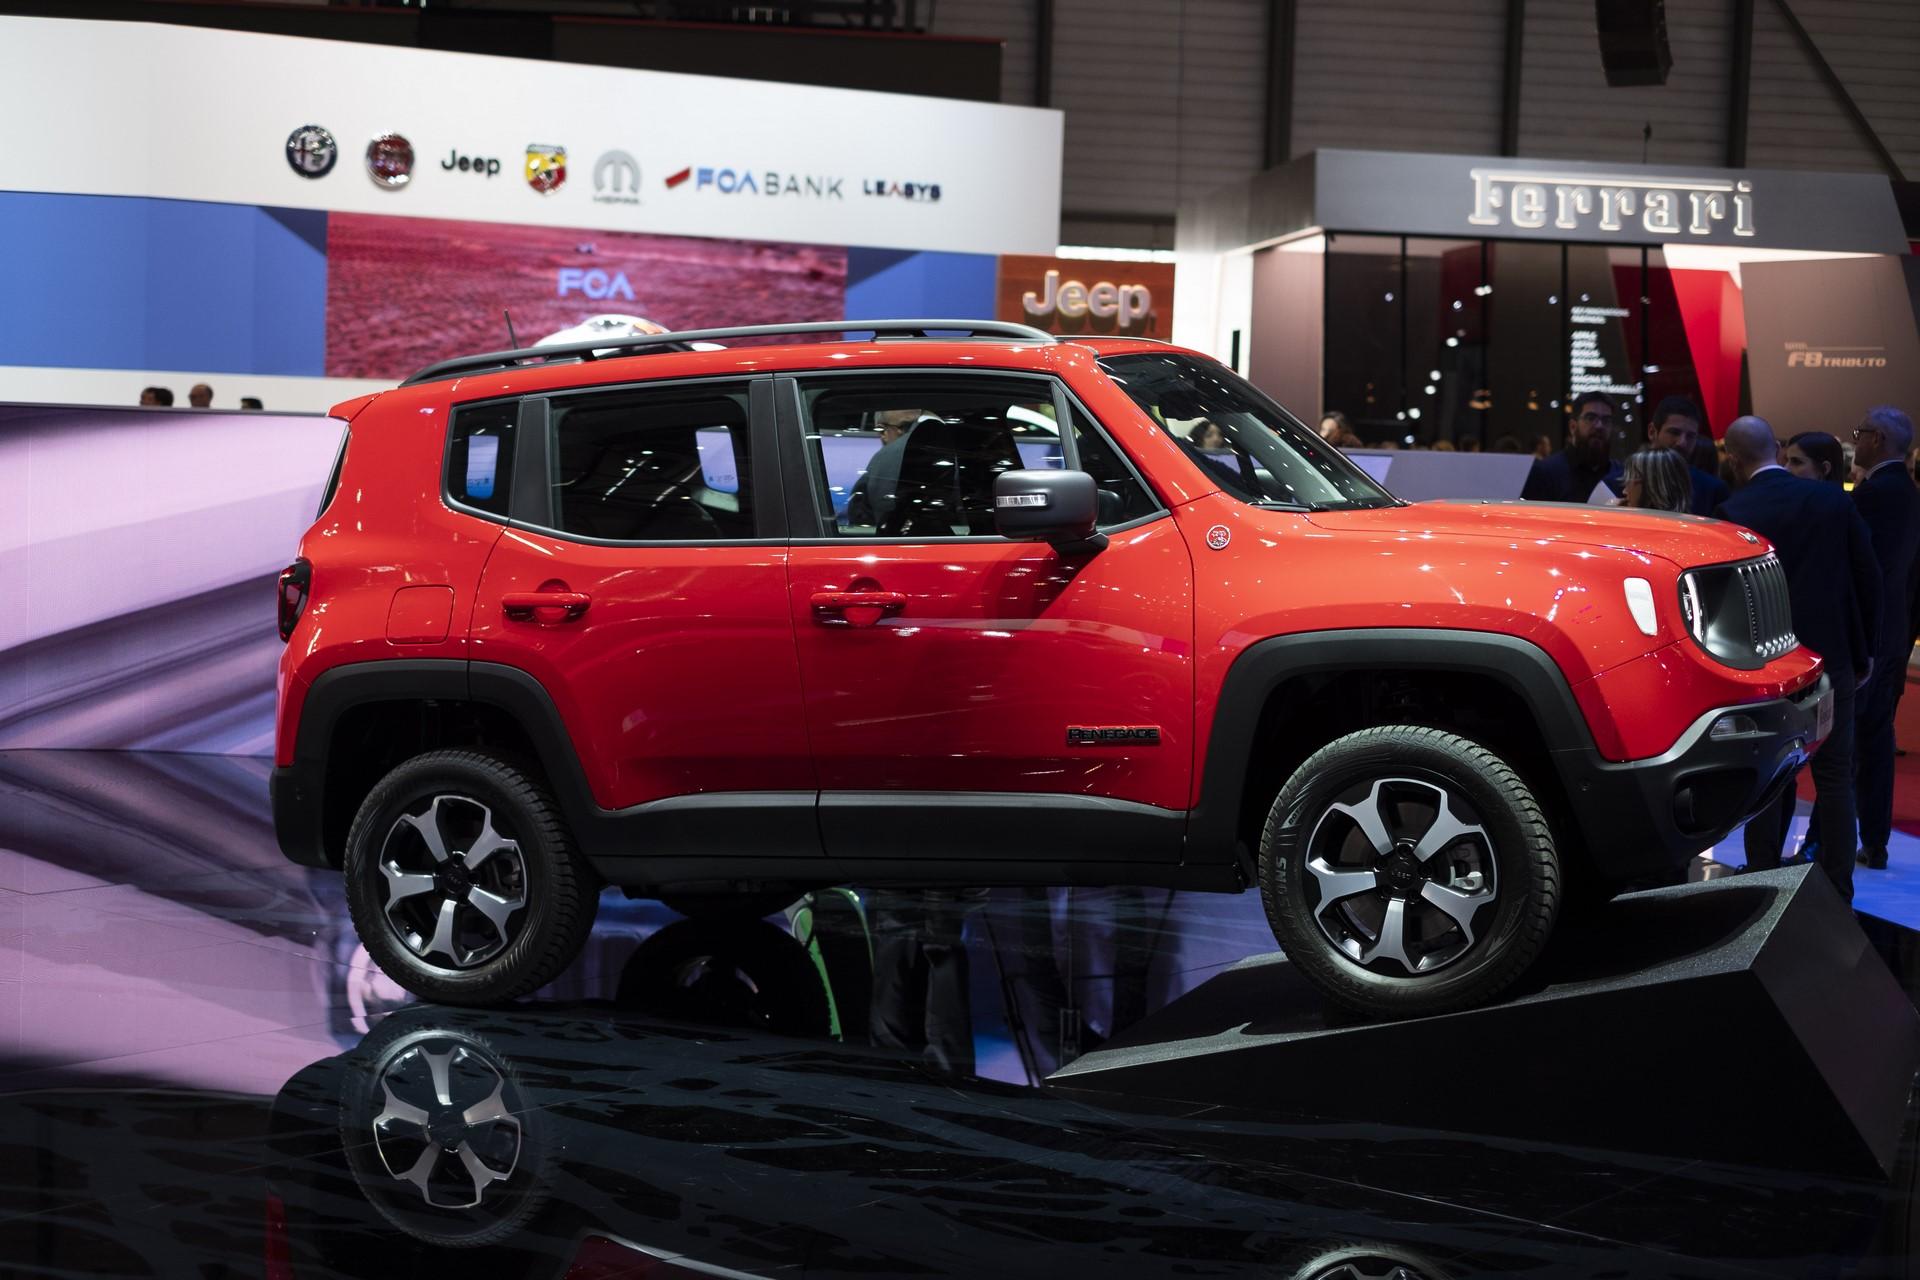 jeep geneva 2019 (1)